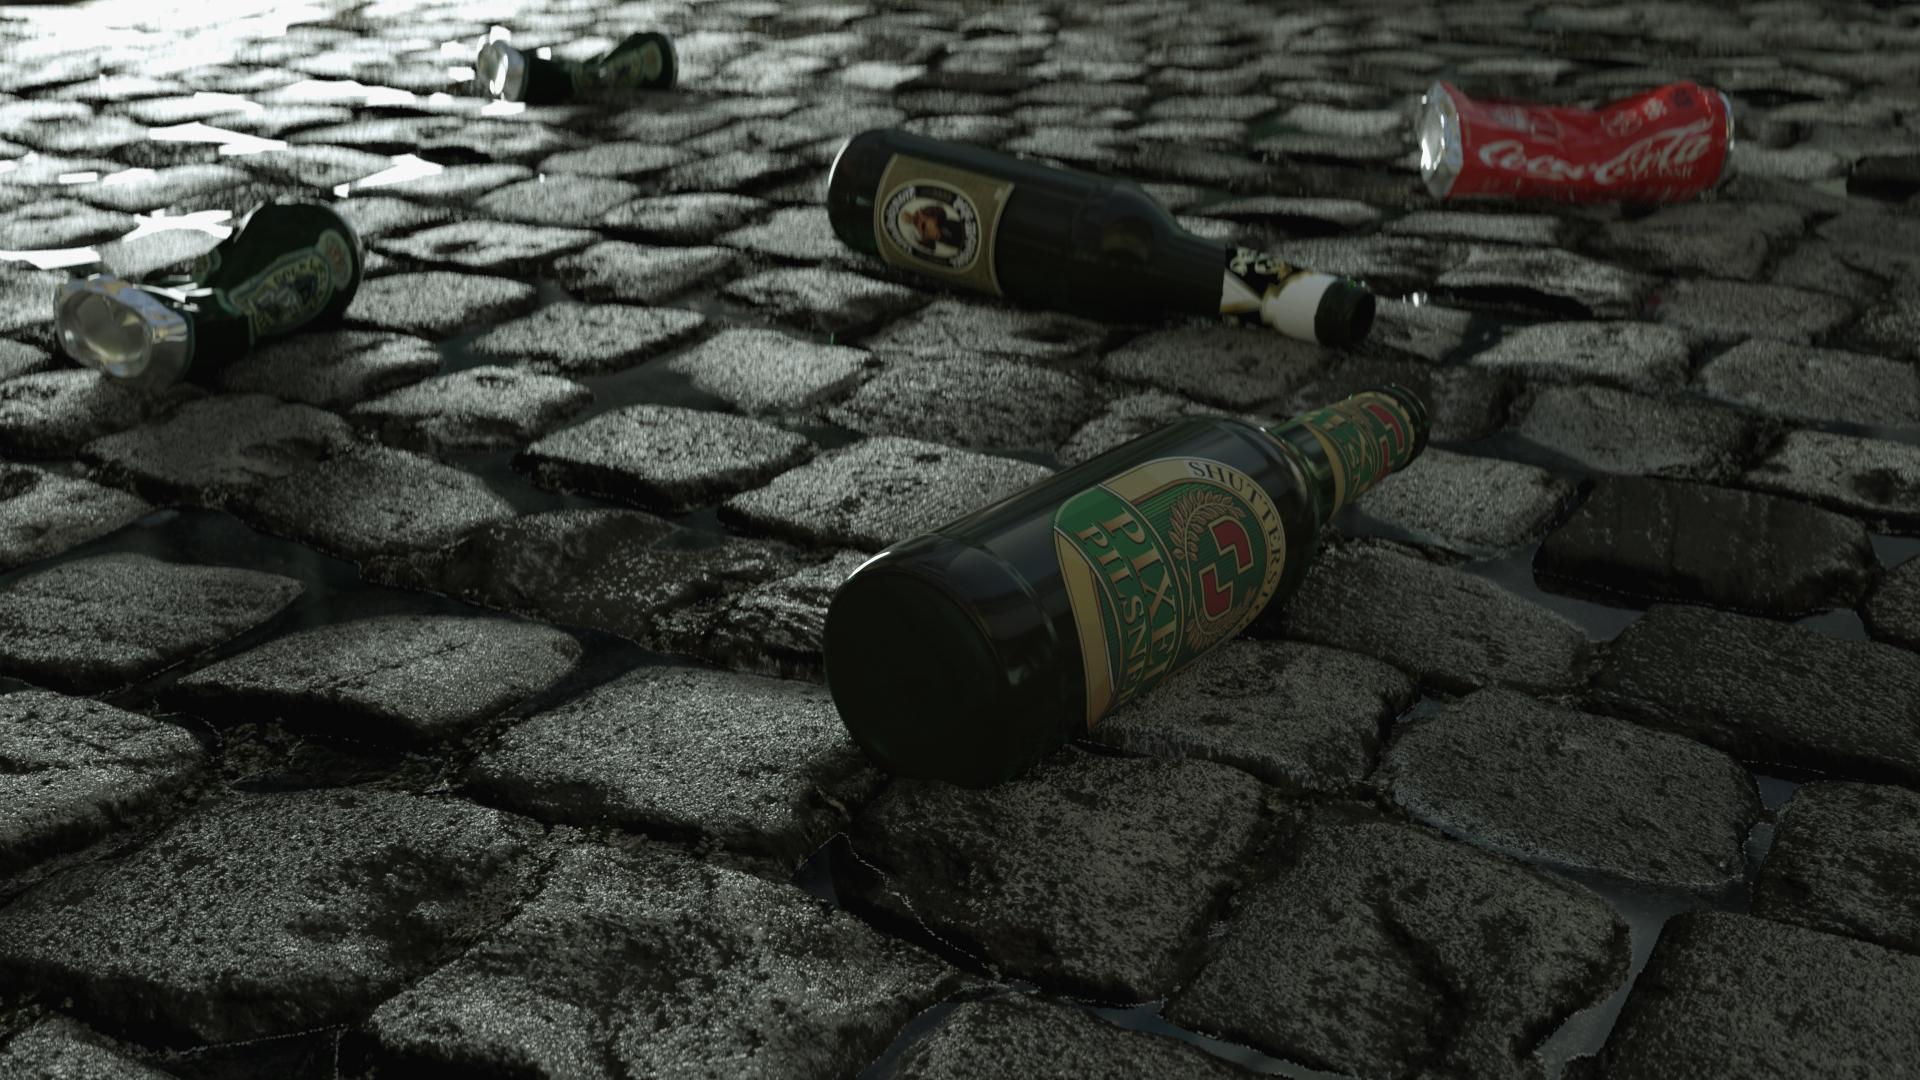 CGMEETUP - Bottle renderd with Octane in C4D by X-ARTIST